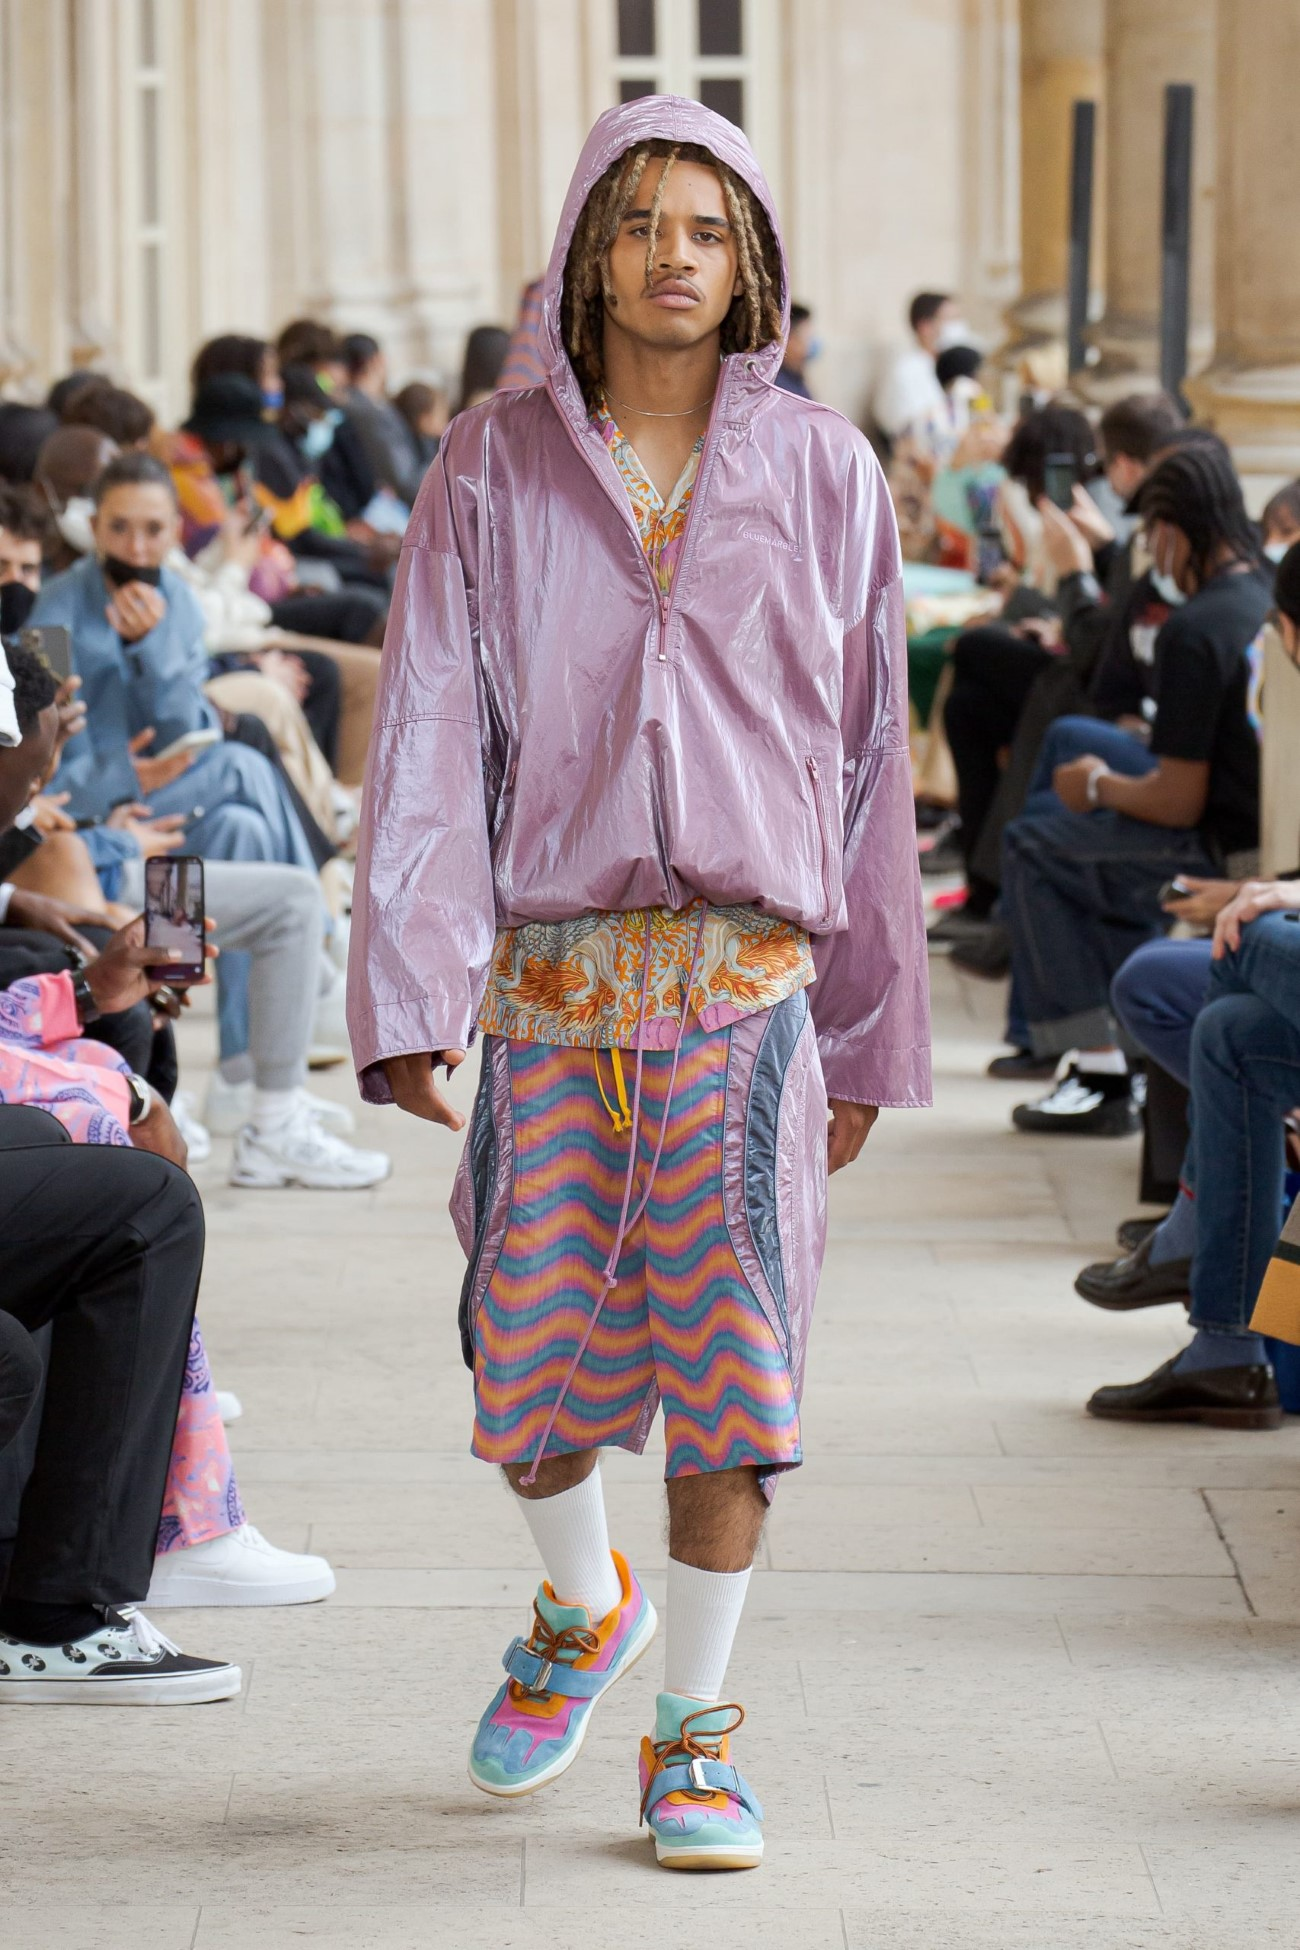 BLUEMARBLE - Printemps-Été 2022 - Paris Fashion Week